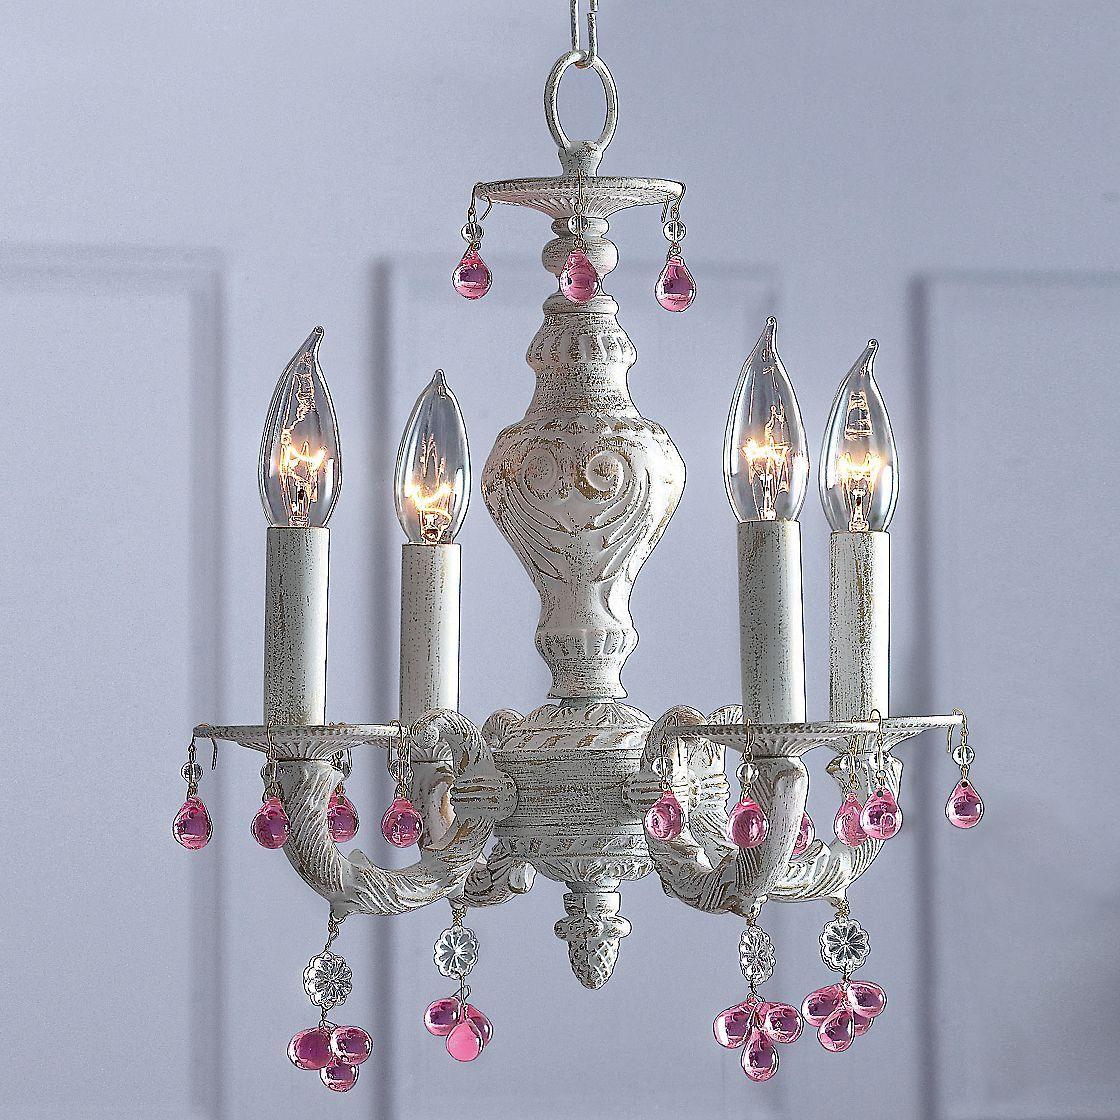 antiqued chandelier 189 tia s room makeover chandelier rh pinterest com